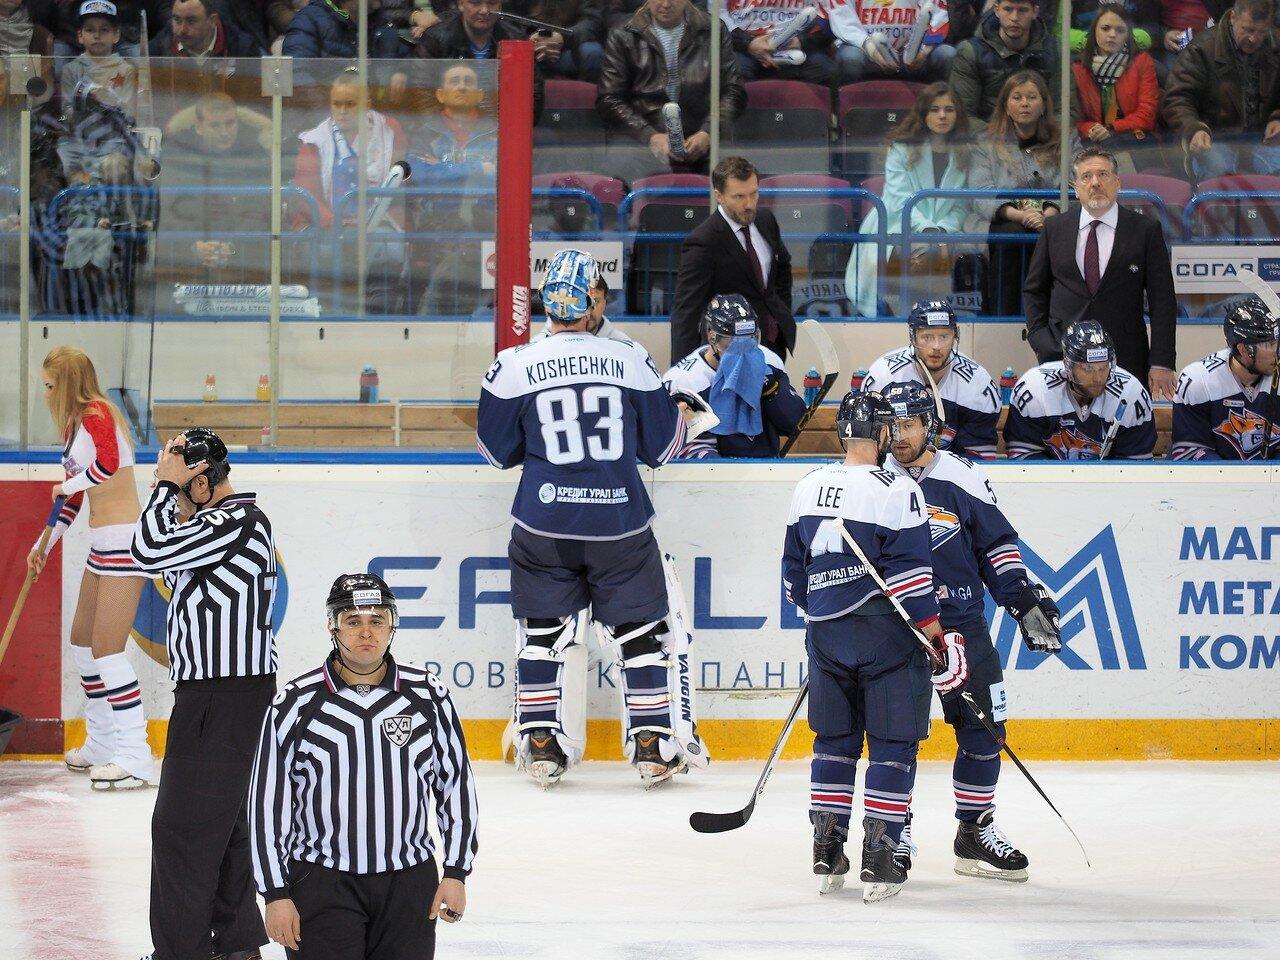 104Плей-офф 2016 Восток Финал Металлург - Салават Юлаев 23.03.2016